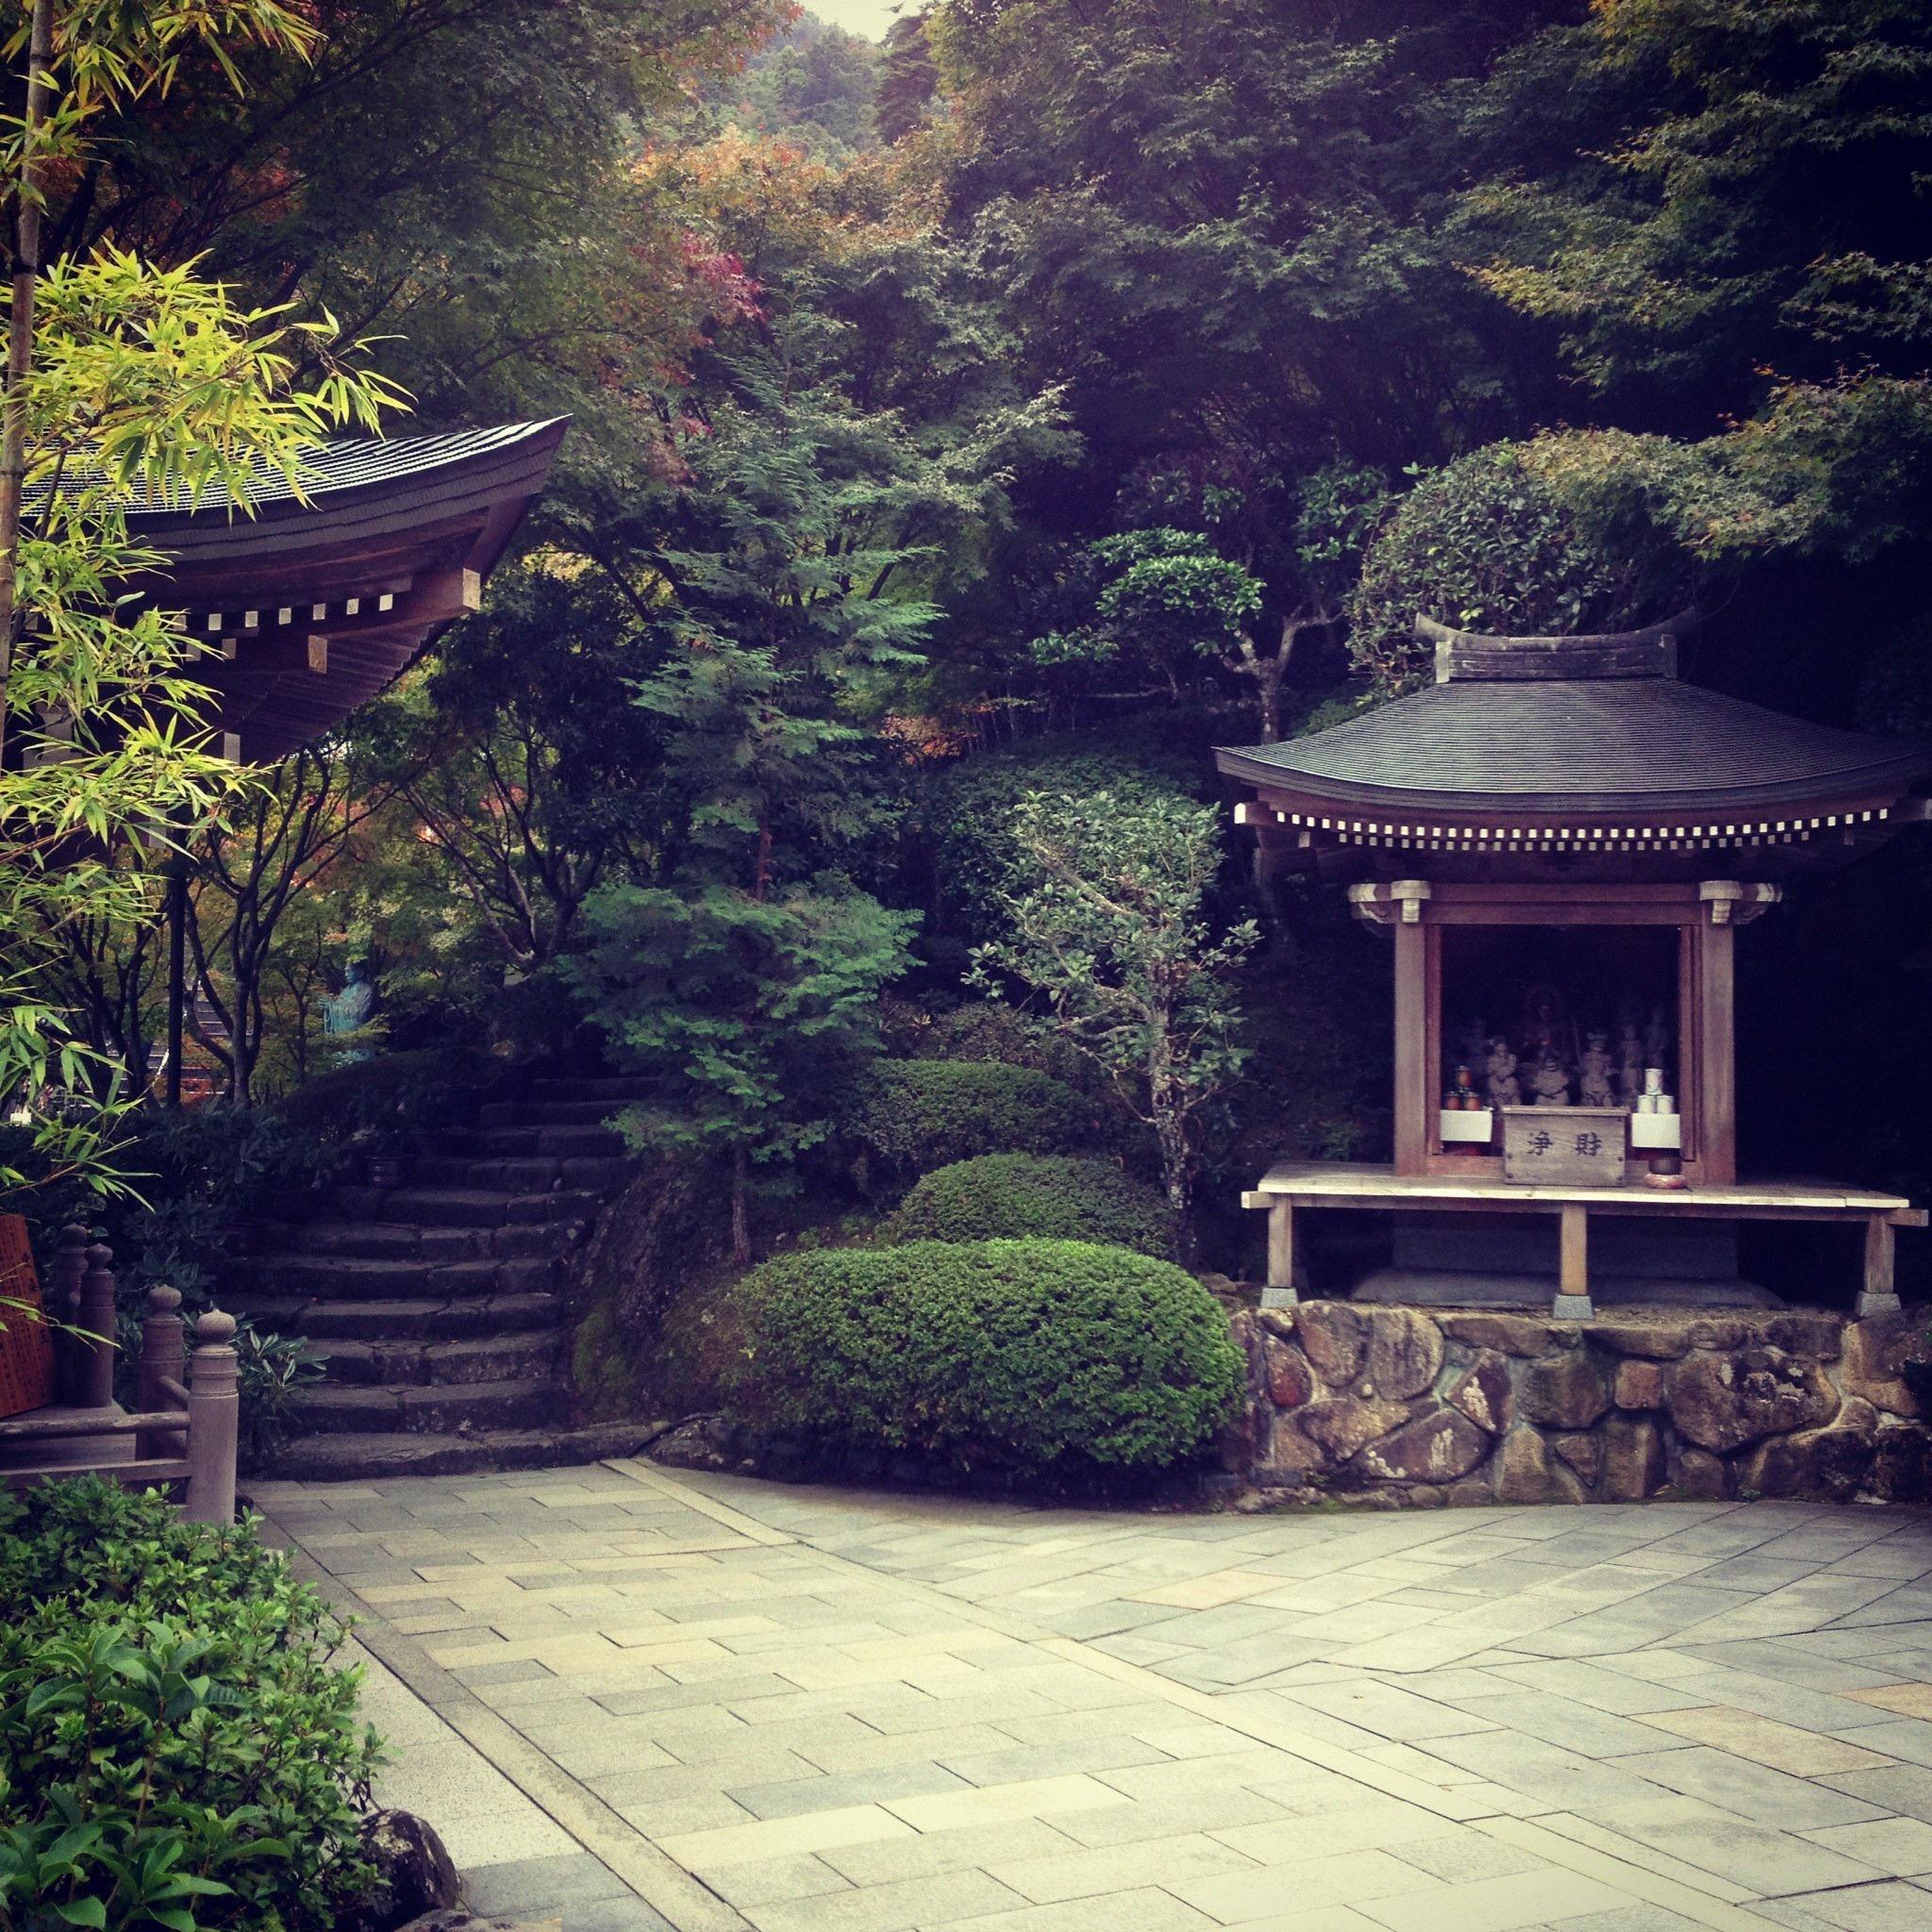 Miyojimo Island Temple